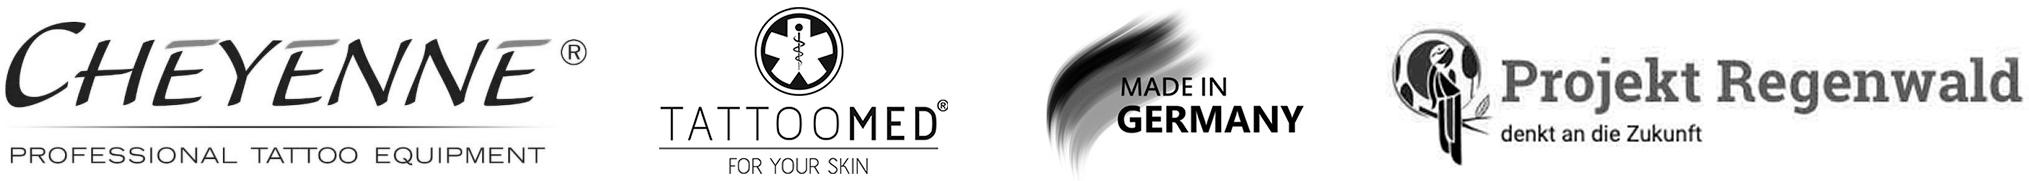 logos_bottom